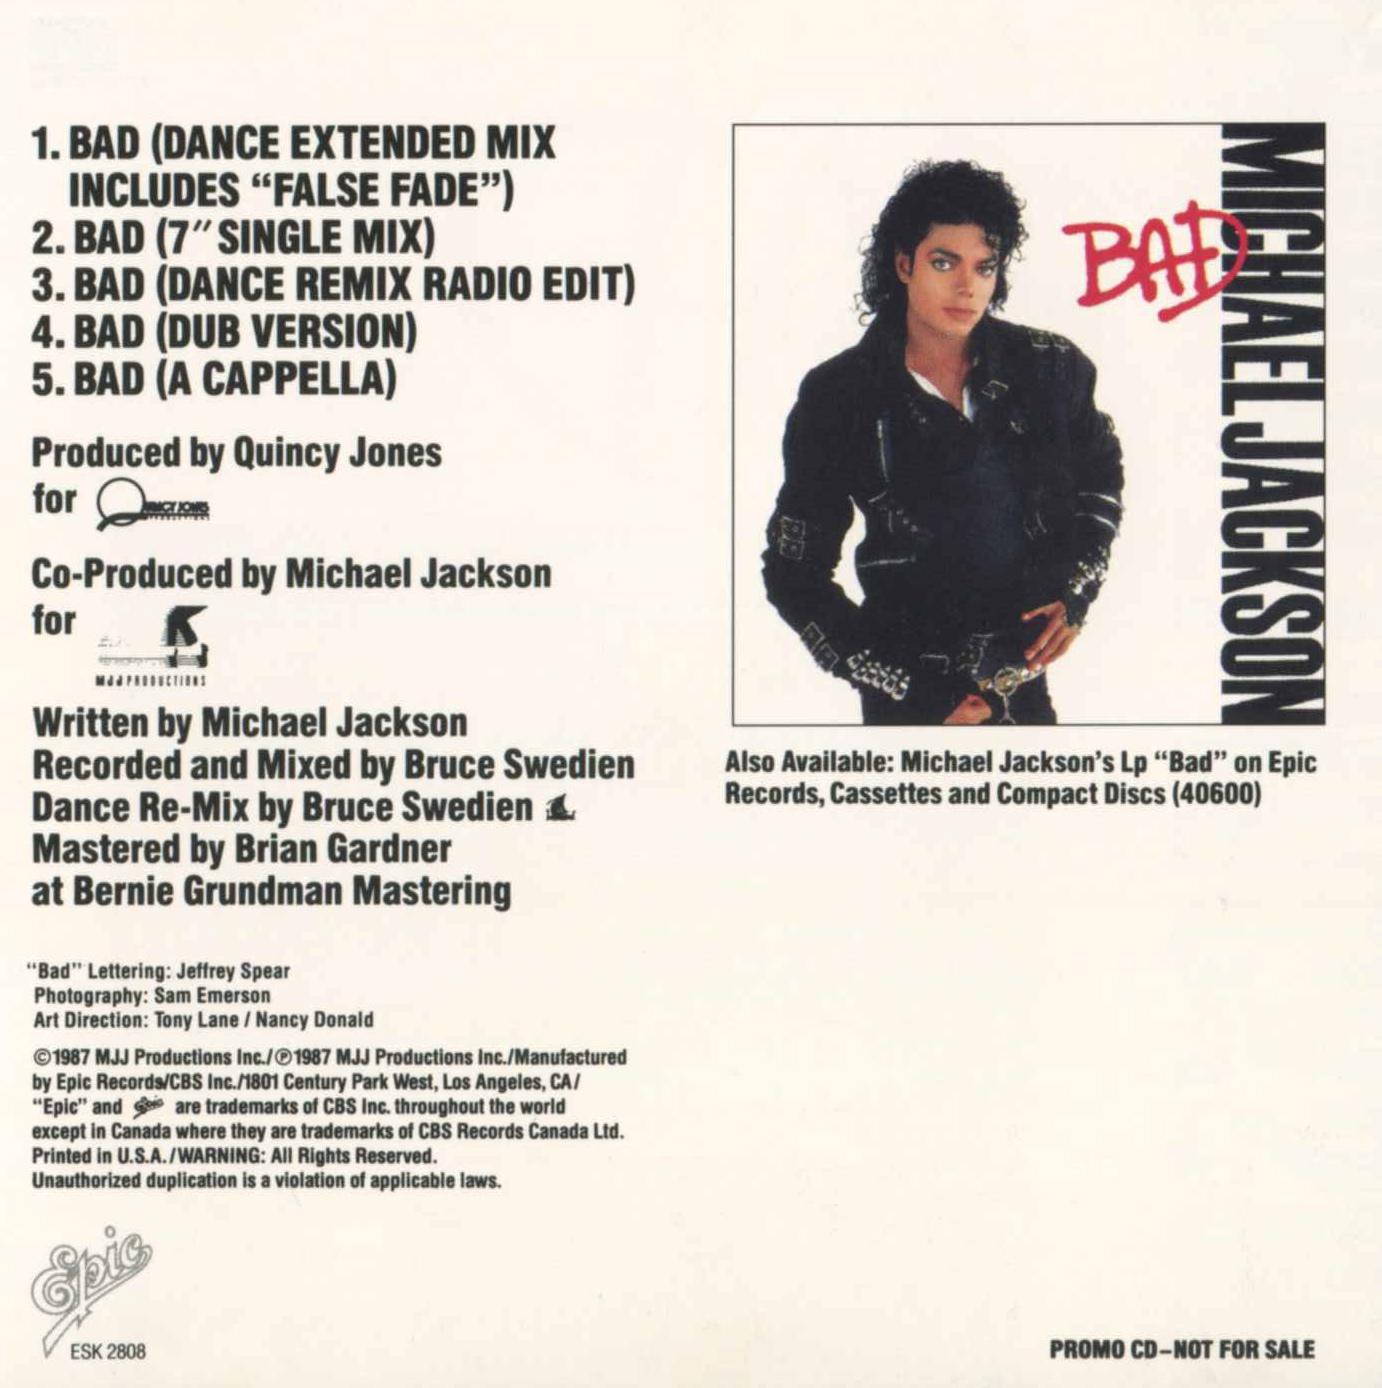 http://1.bp.blogspot.com/-jC5kASHLvLI/TzXUBXm481I/AAAAAAAADVY/hZvxDGSKbe4/s1600/Michael+Jackson+Bad+Back.jpg